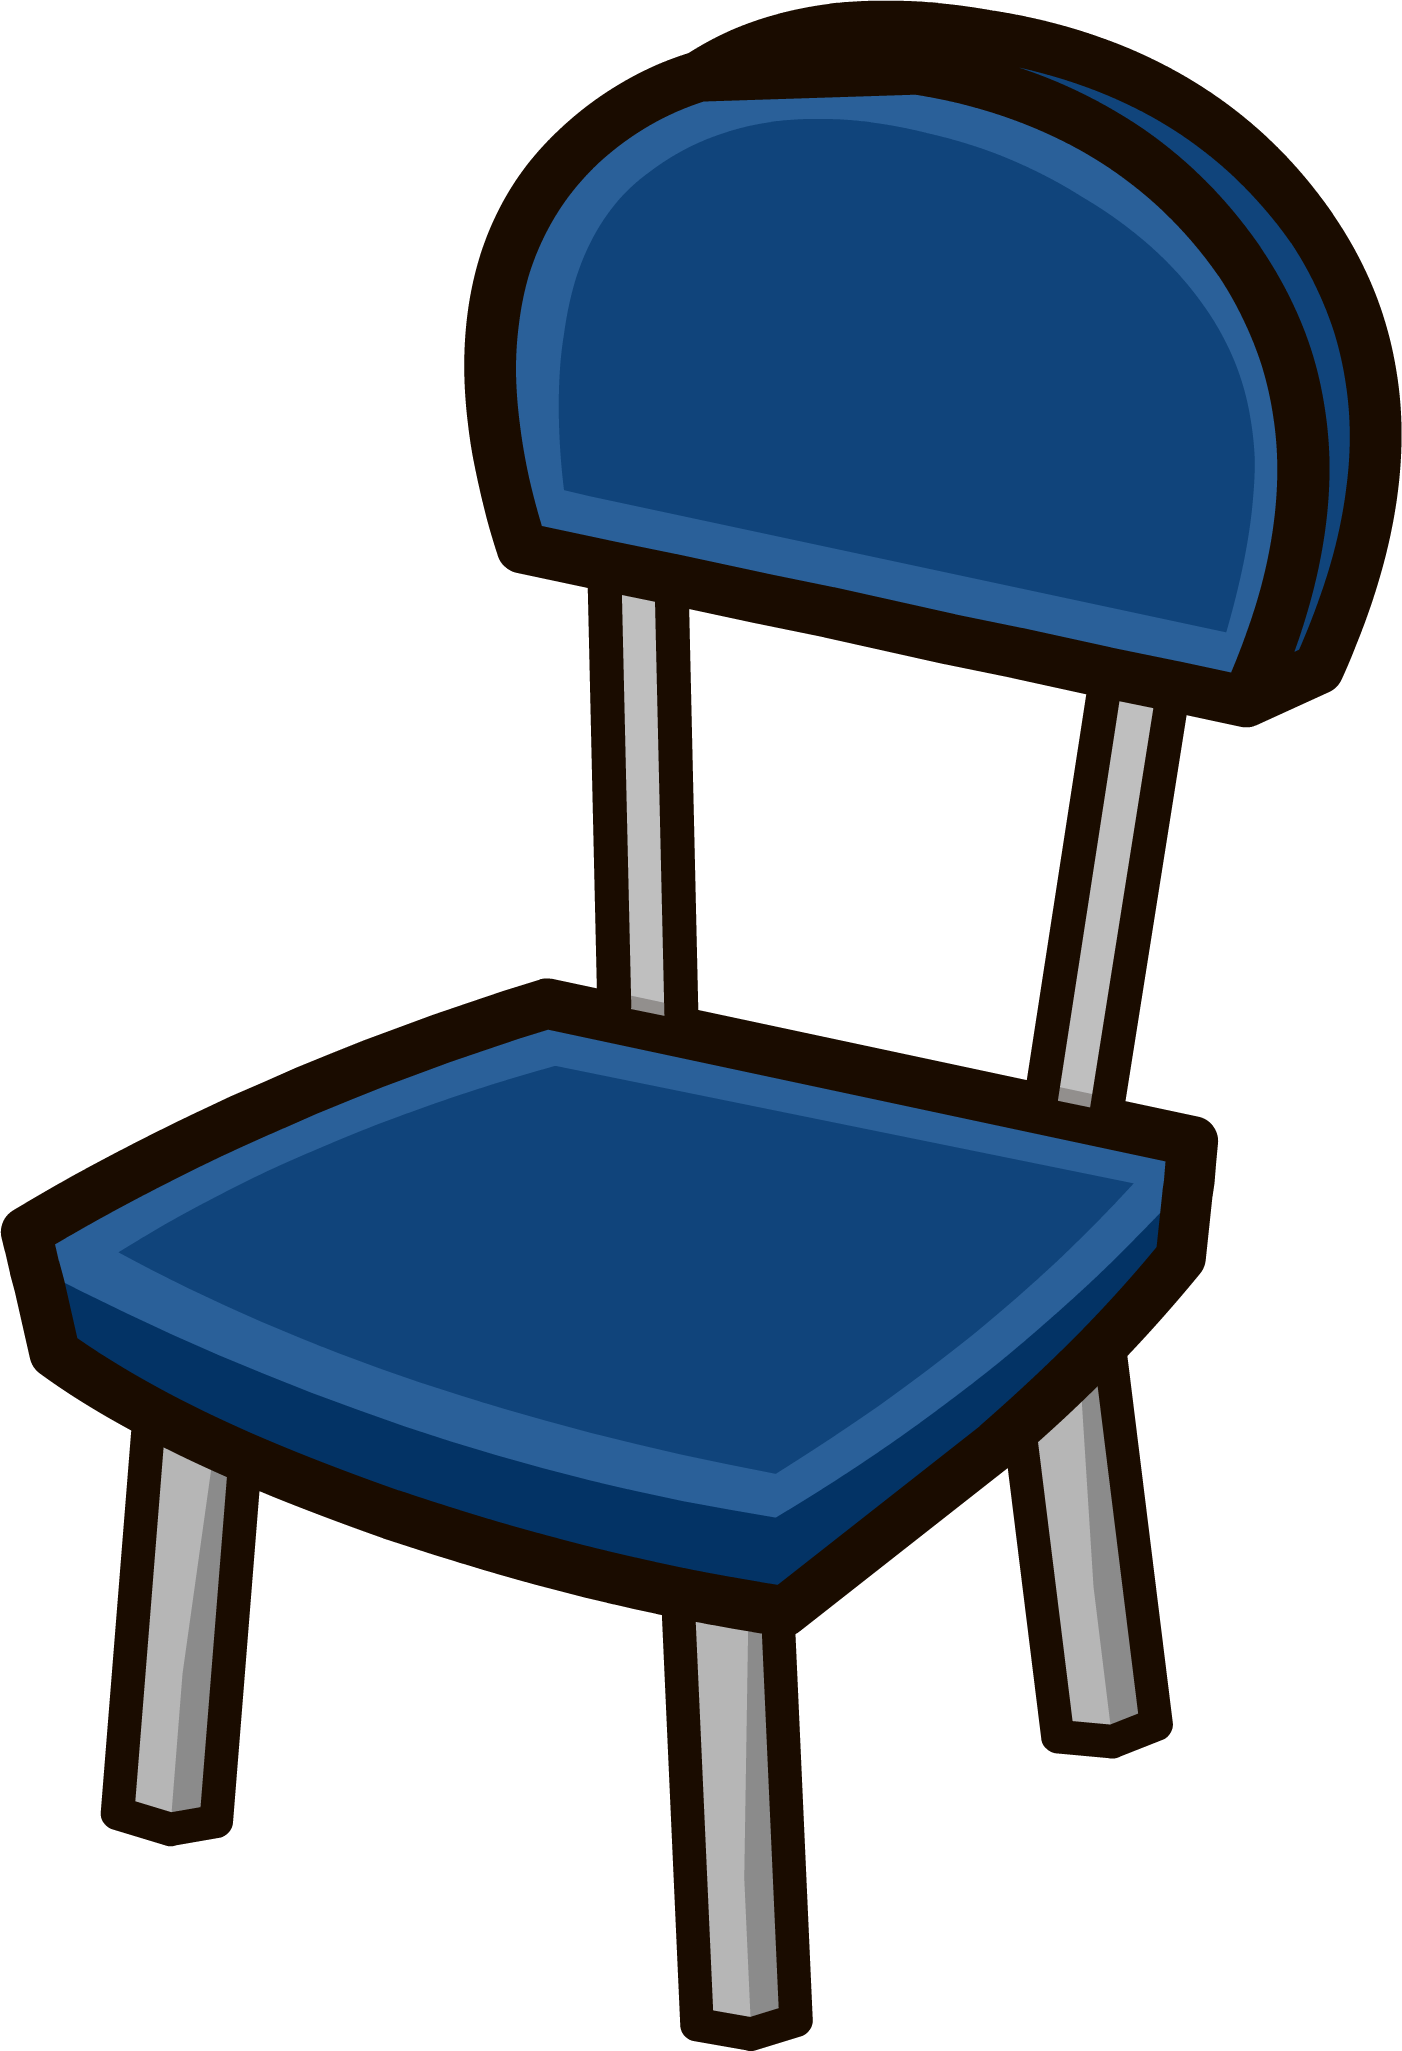 Clipart chair blue chair, Clipart chair blue chair ...